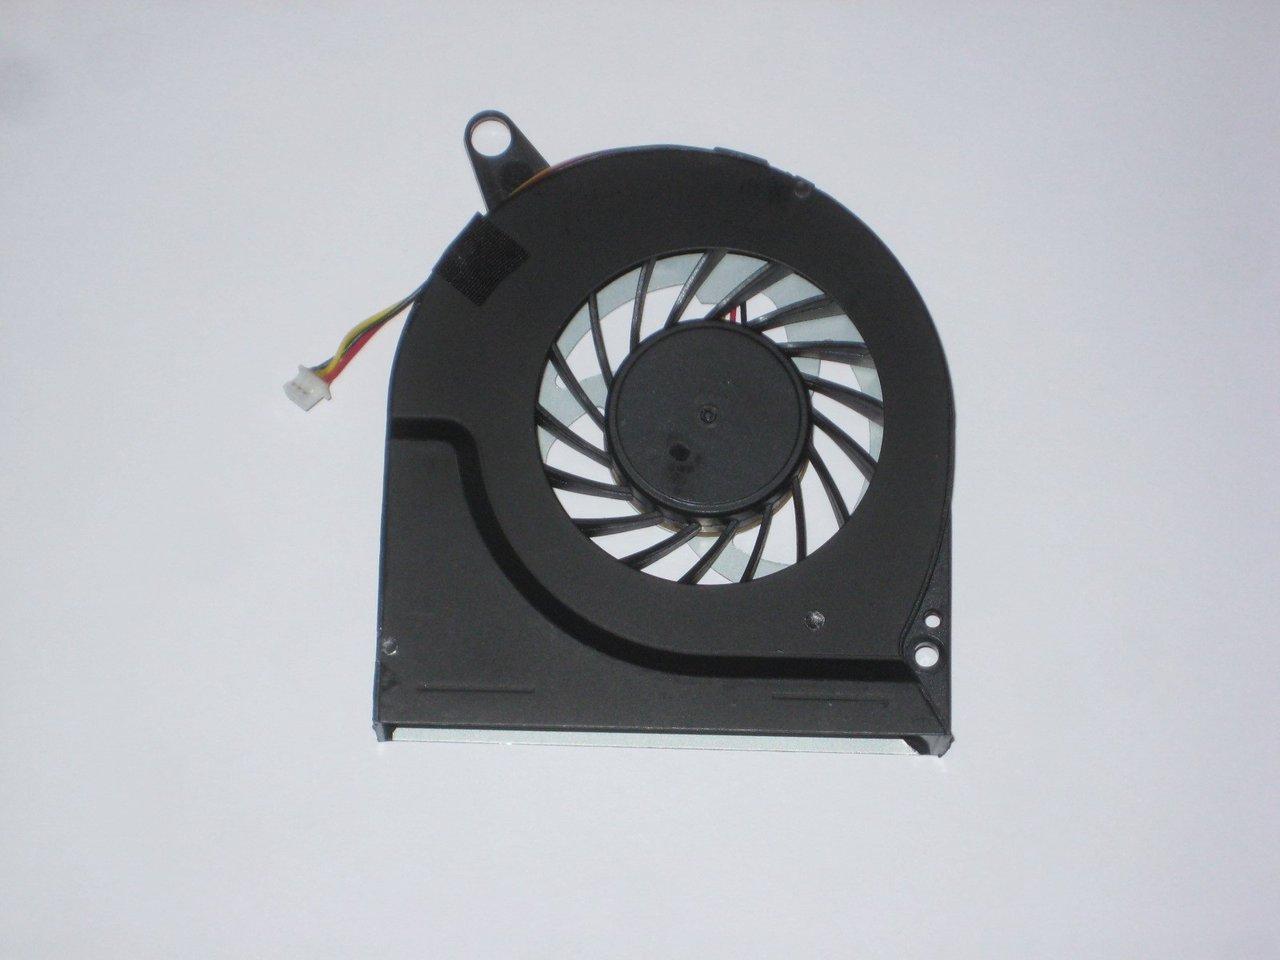 FCN DFS551205ML0T FBC7 Kühler Lüfter für ACER Notebook